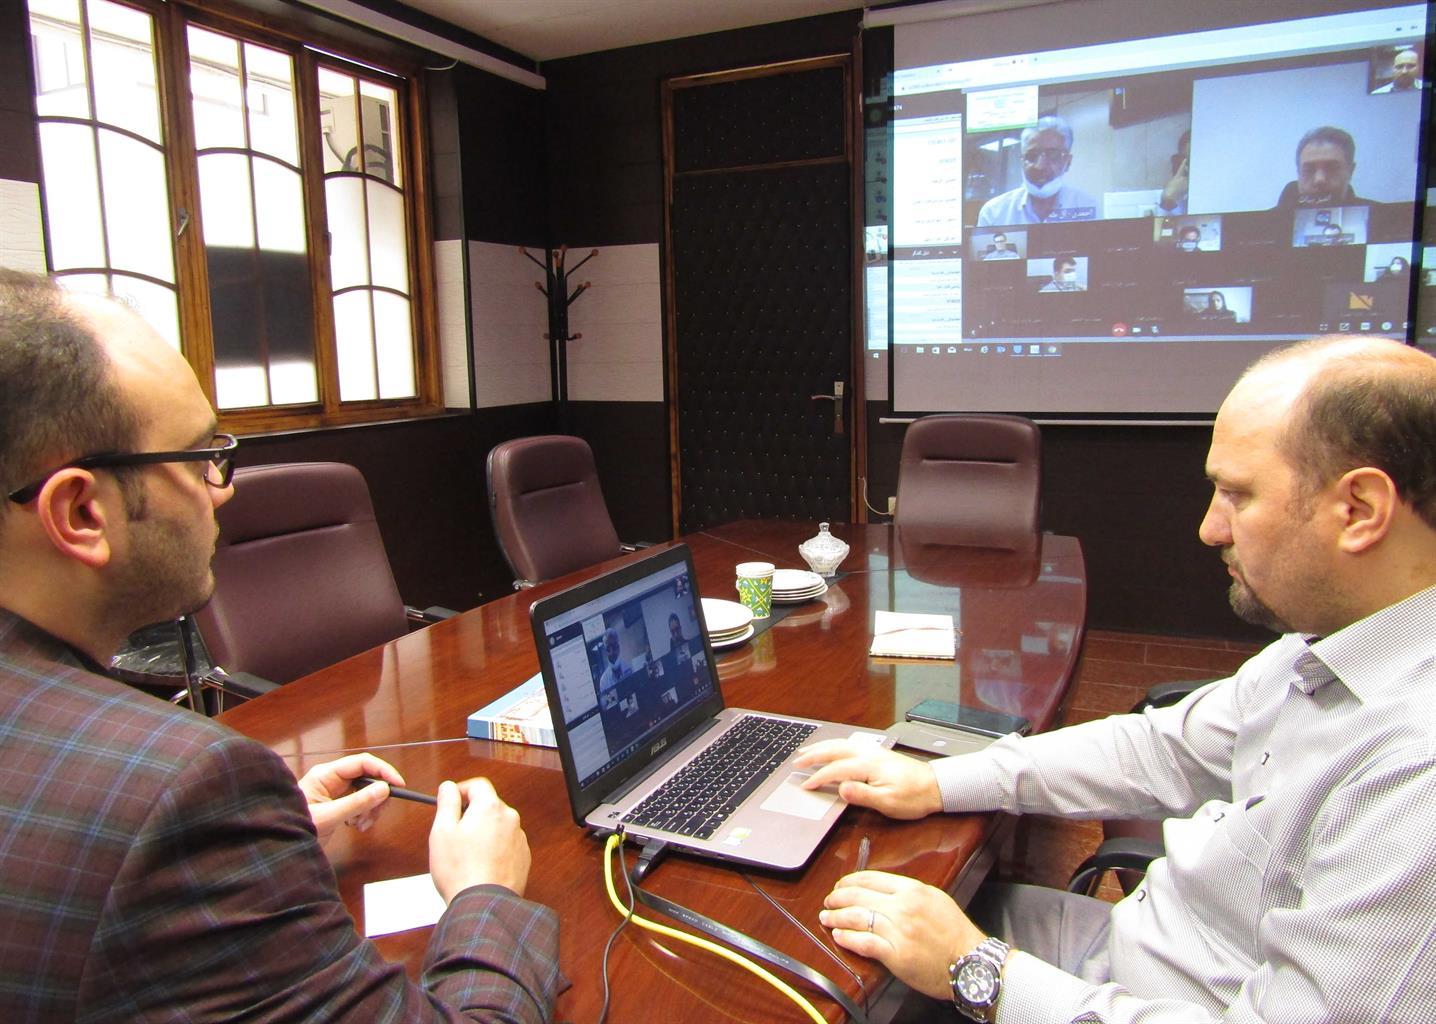 favasession3 - برپایی اولین نشست مجازی کمیسیون فناوری اطلاعات و شهر هوشمند کلانشهرهای کشور